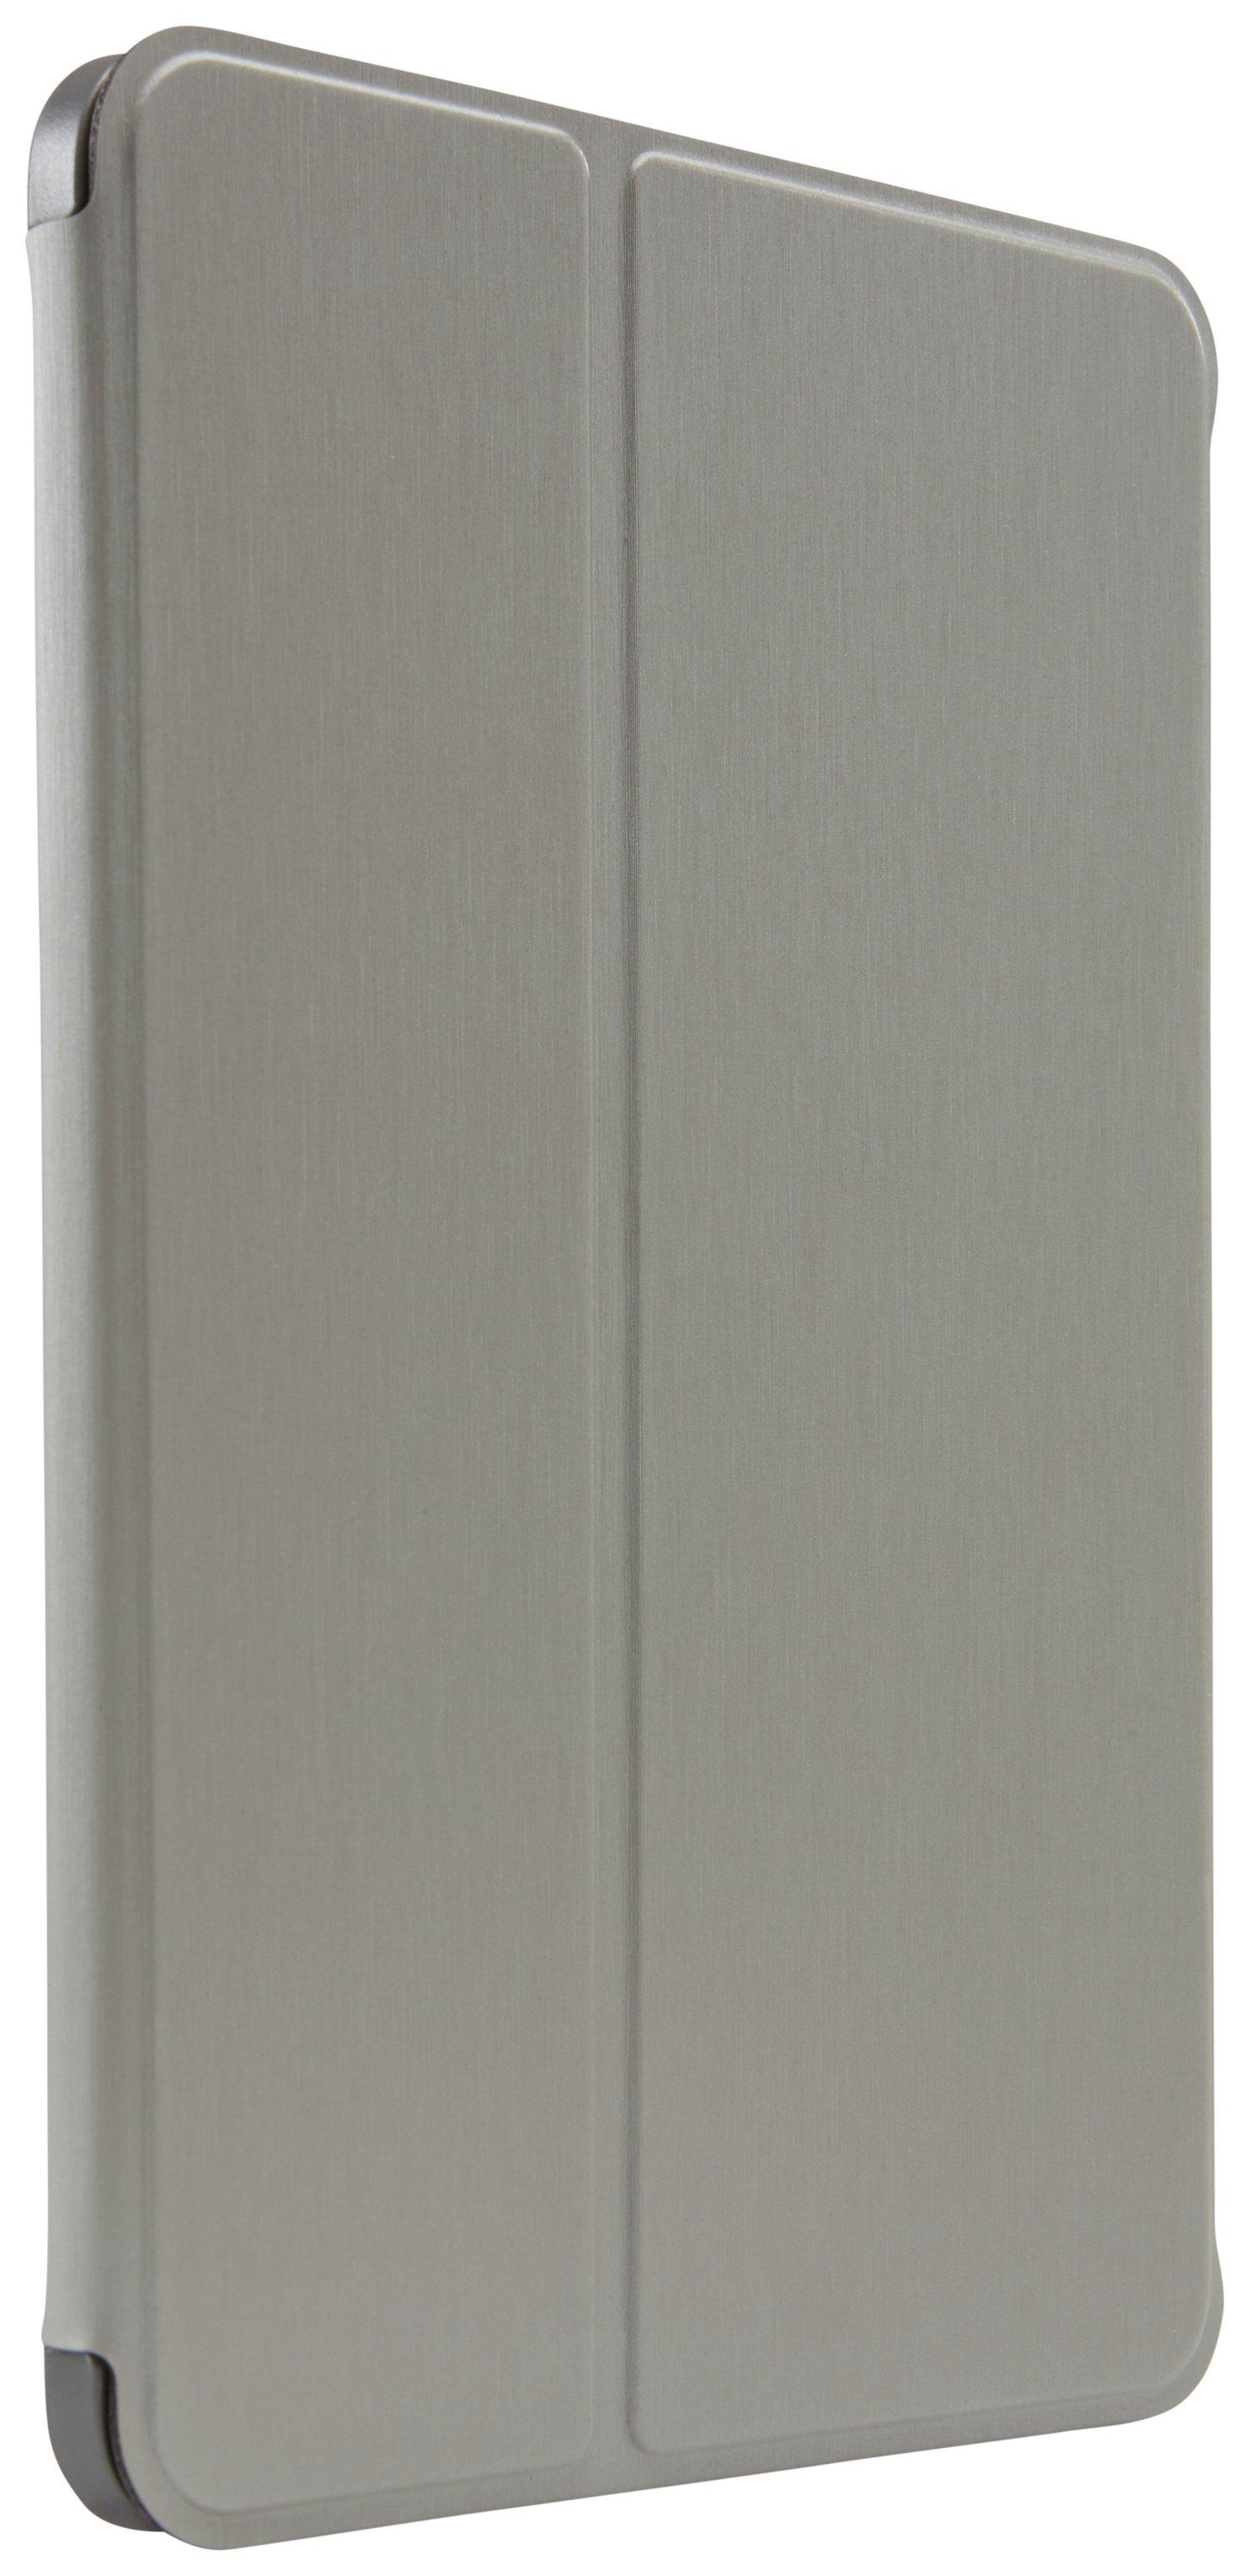 Case Logic Snapview Folio For iPad Mini 3 - Grey.